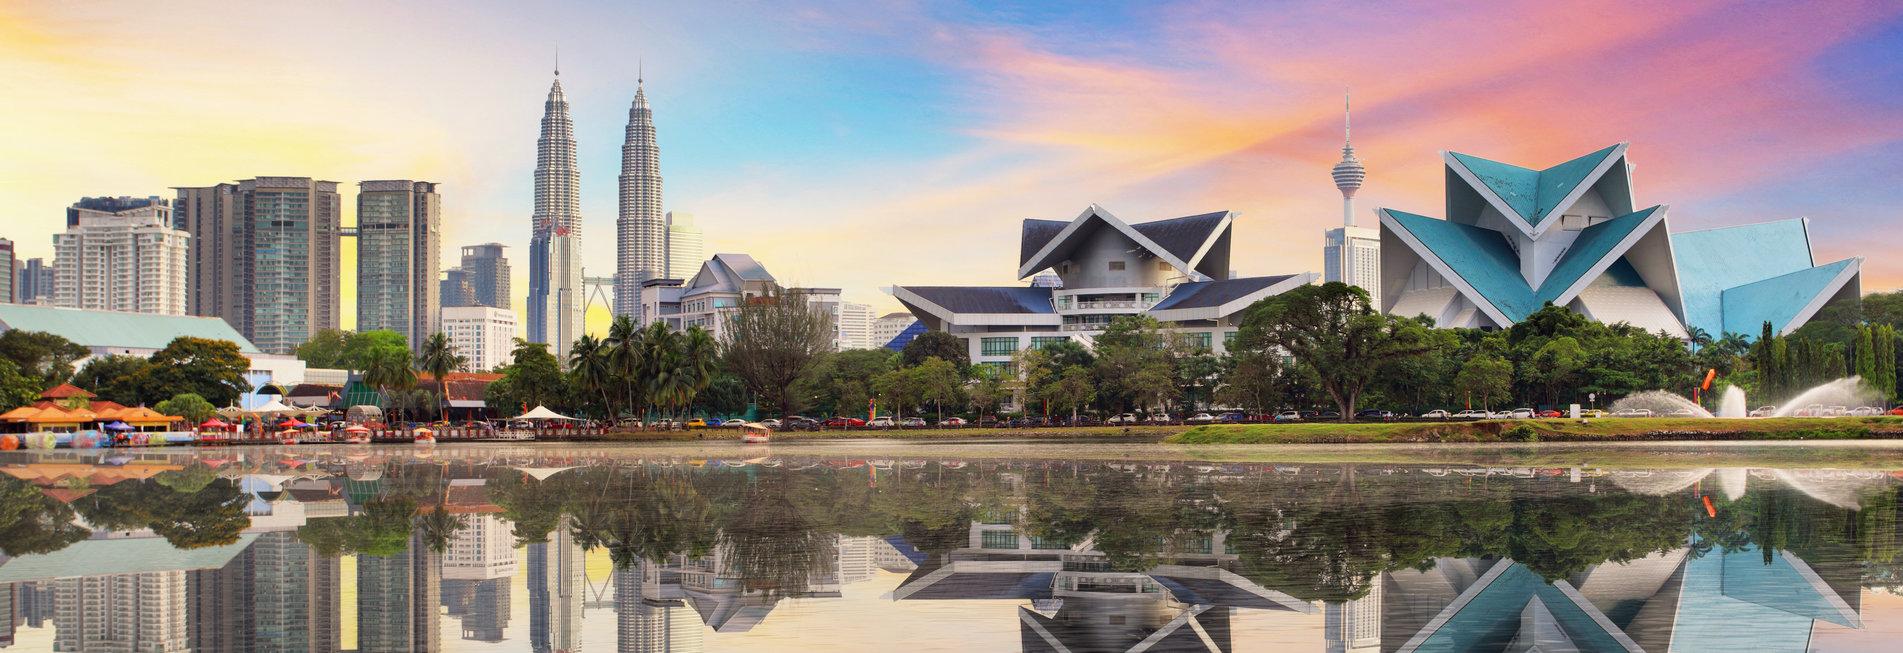 Kleingruppen-Rundreisen Singapur & Malaysia